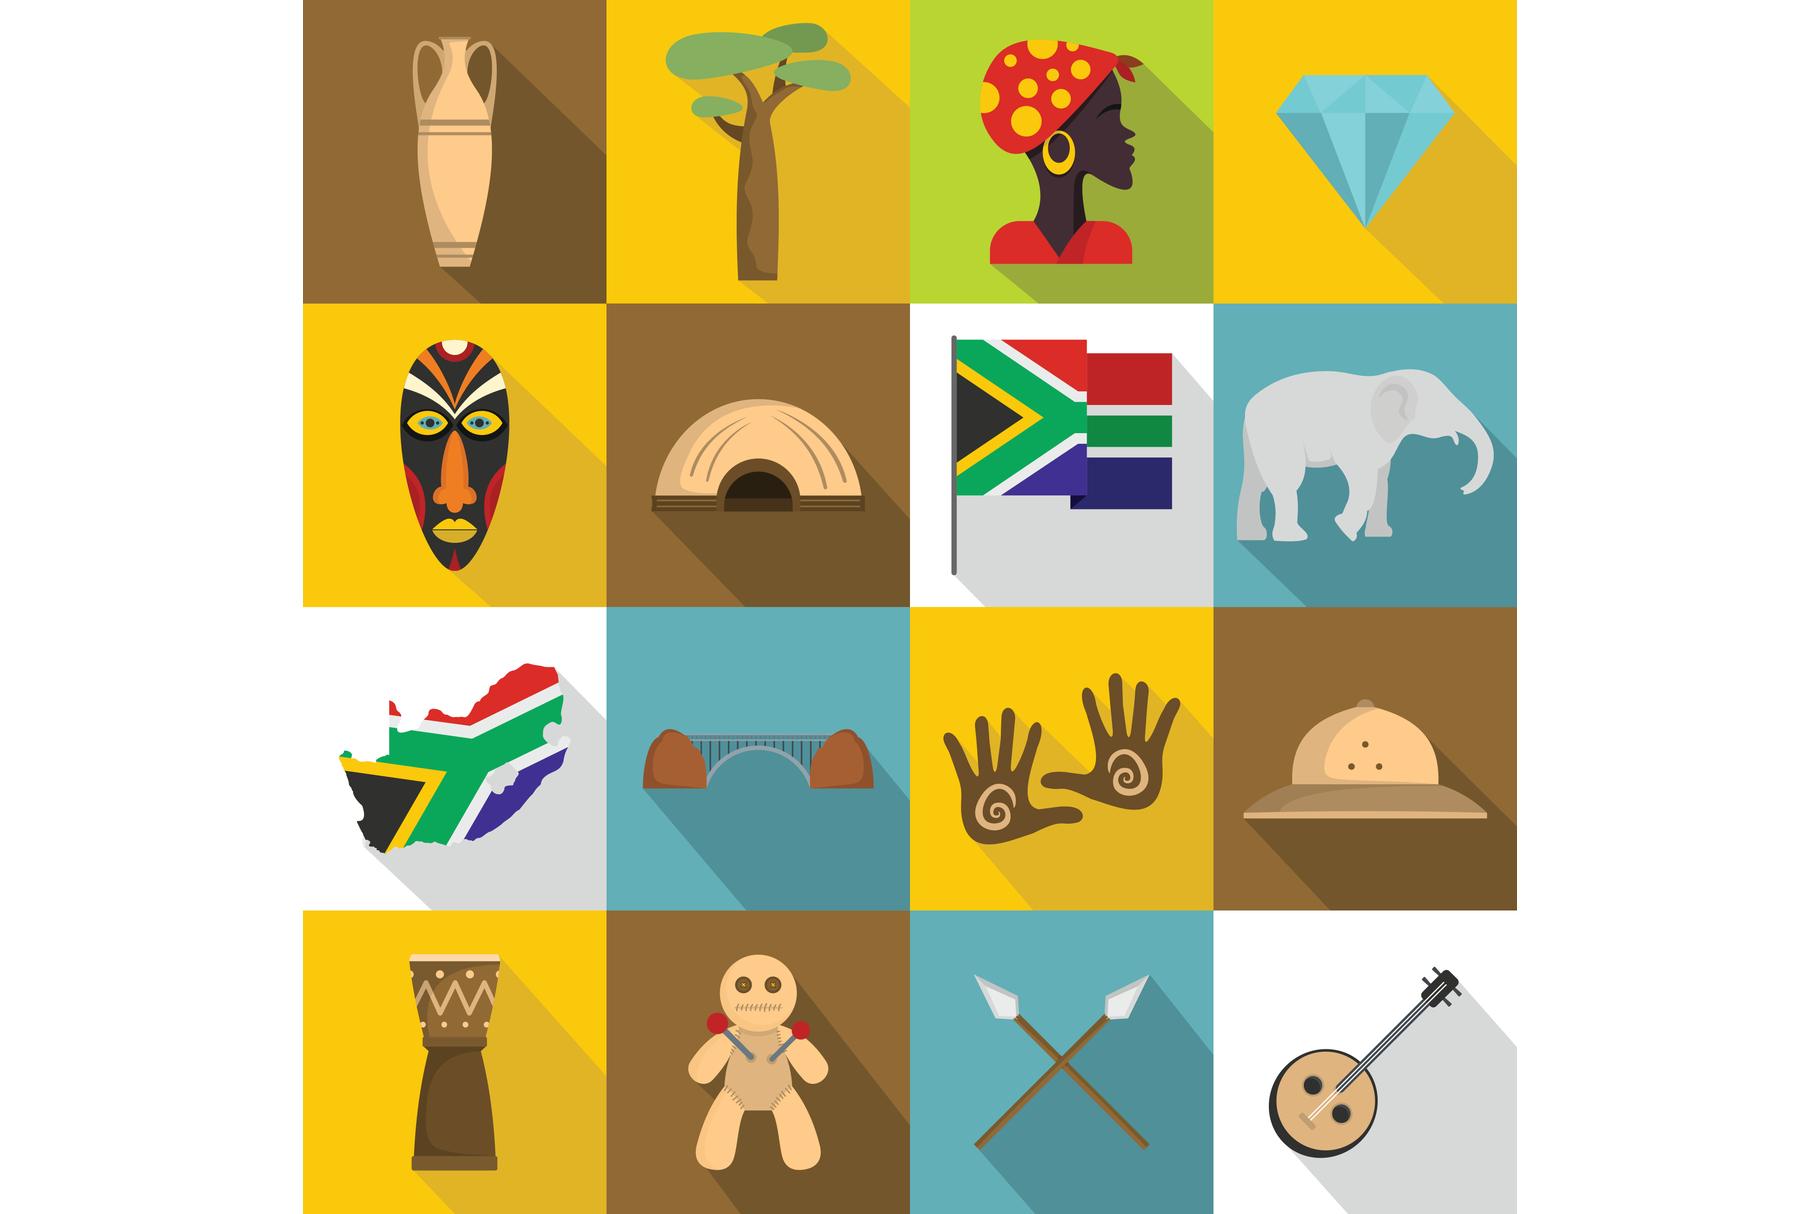 South Africa travel icons set, flat style example image 1